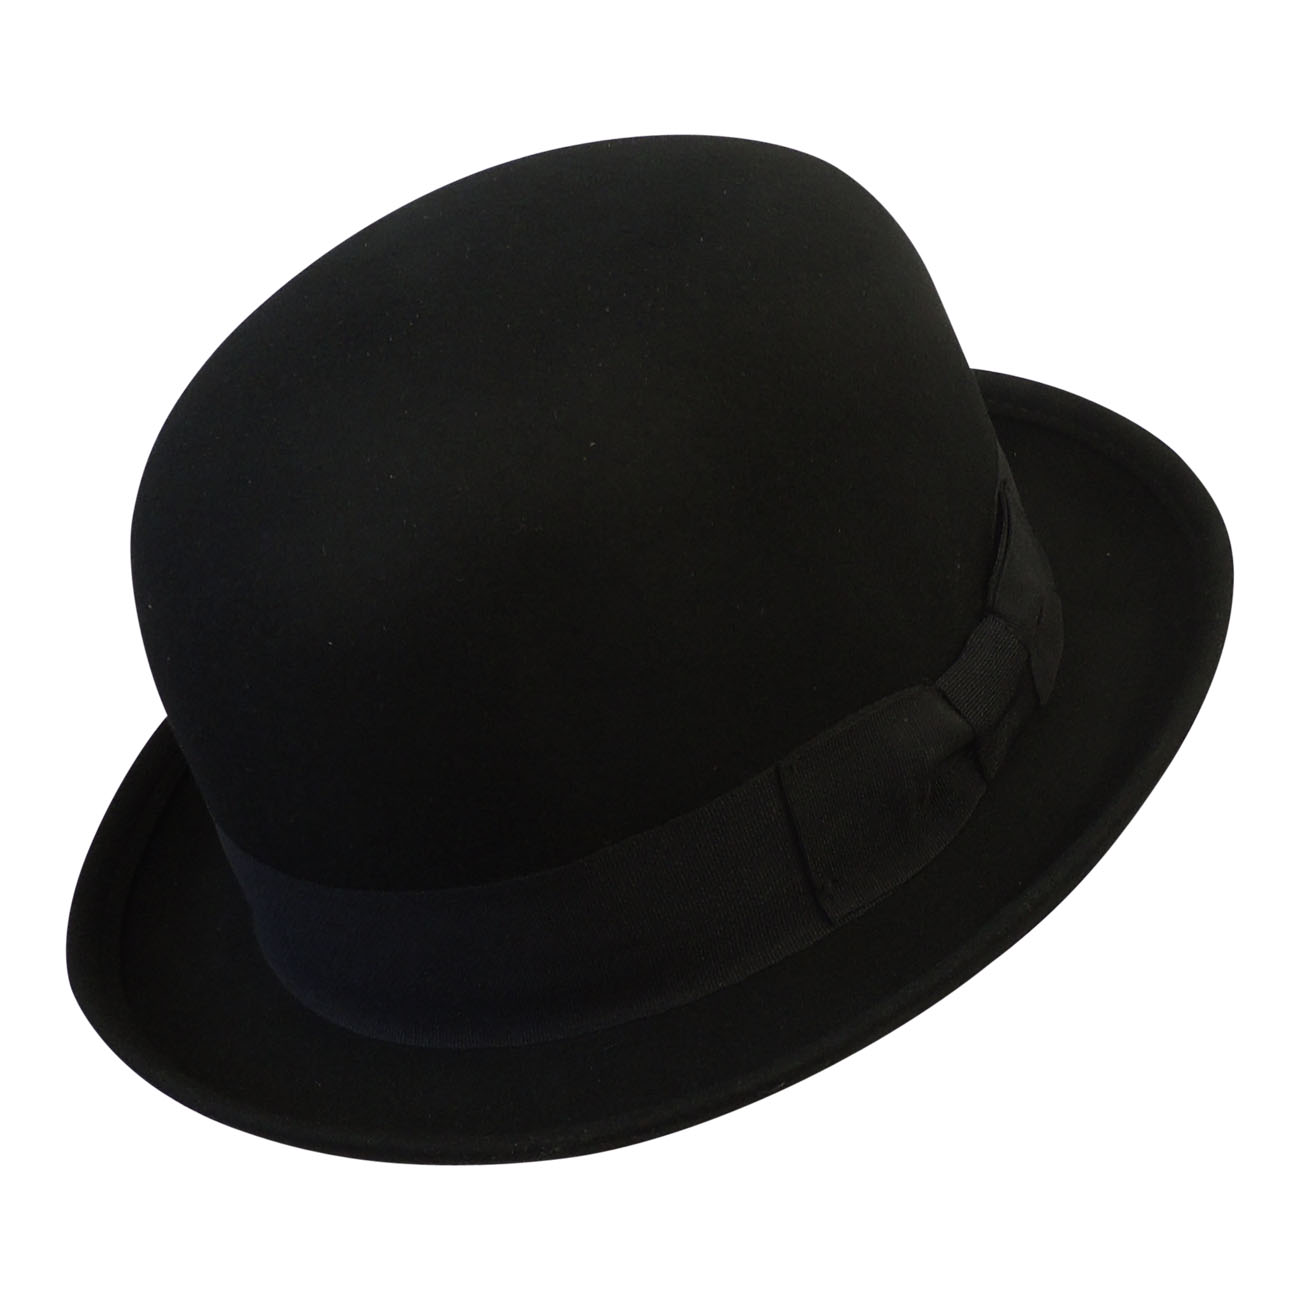 a146edc8dd New Men's Classic Vintage style 1920's 1930's 1940's Black Wool Felt Bowler  Hat